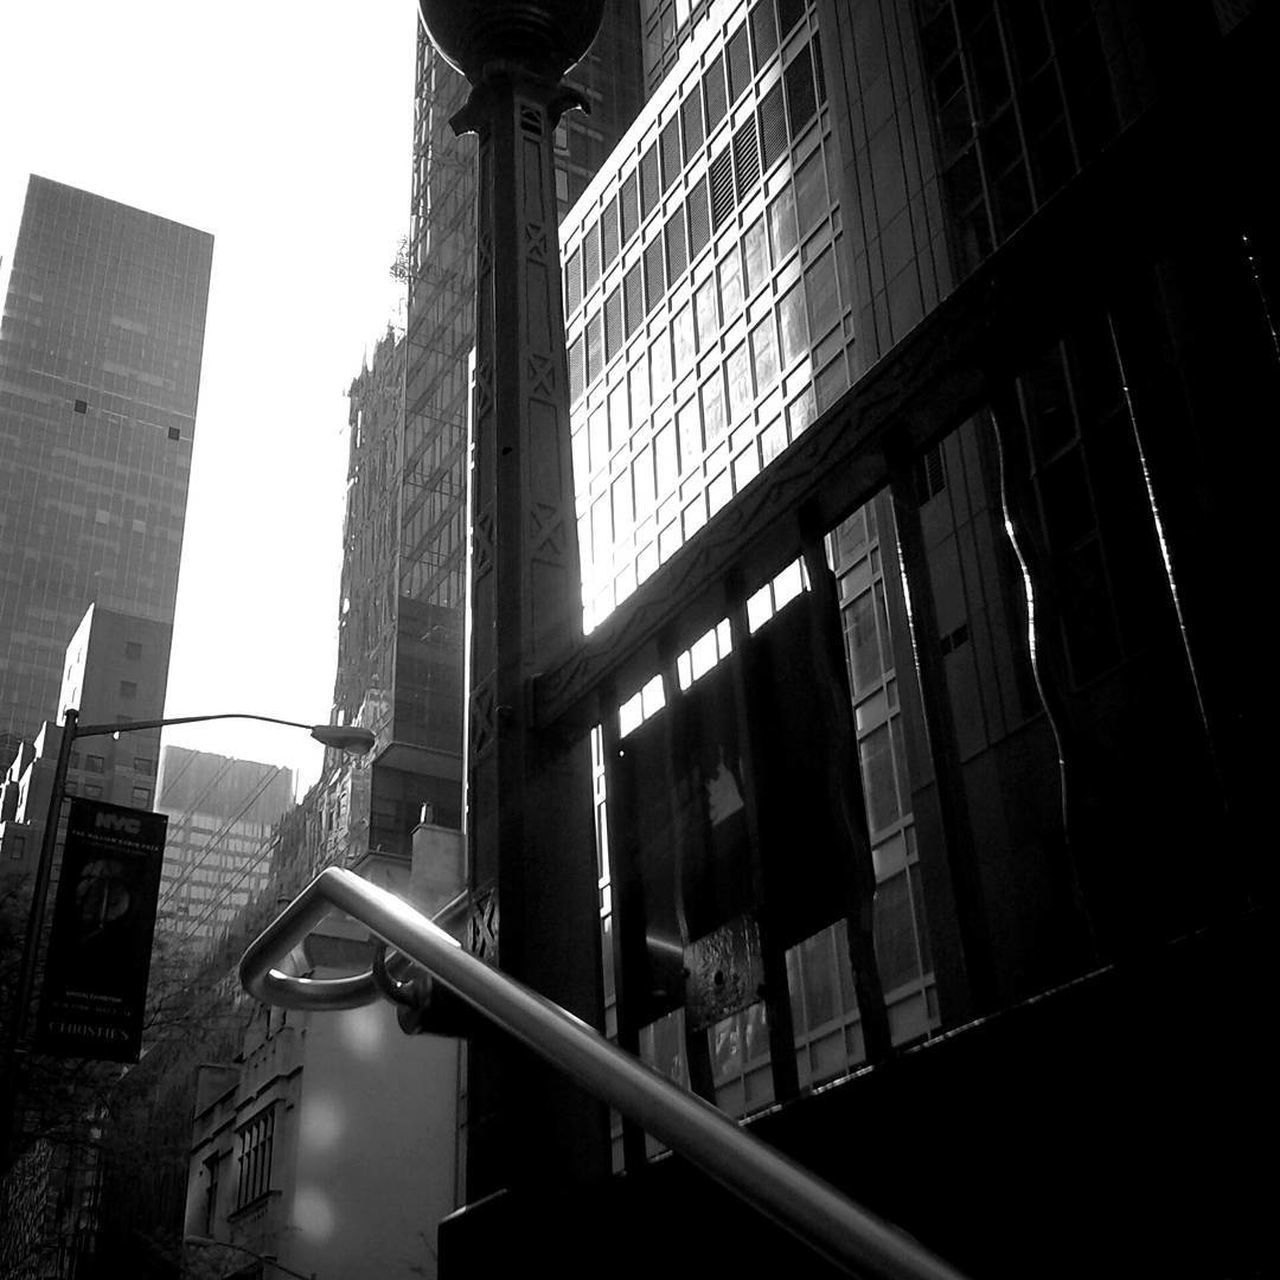 Manhattan Undergroundstation Subway Subway Station New York Big Apple Newyorkstreet NYC NYC Photography New York City Urbanlife Black & White Urbanexploration My Year My View Urban Exploration USA United States Minimalist Architecture Minimalist Architecture